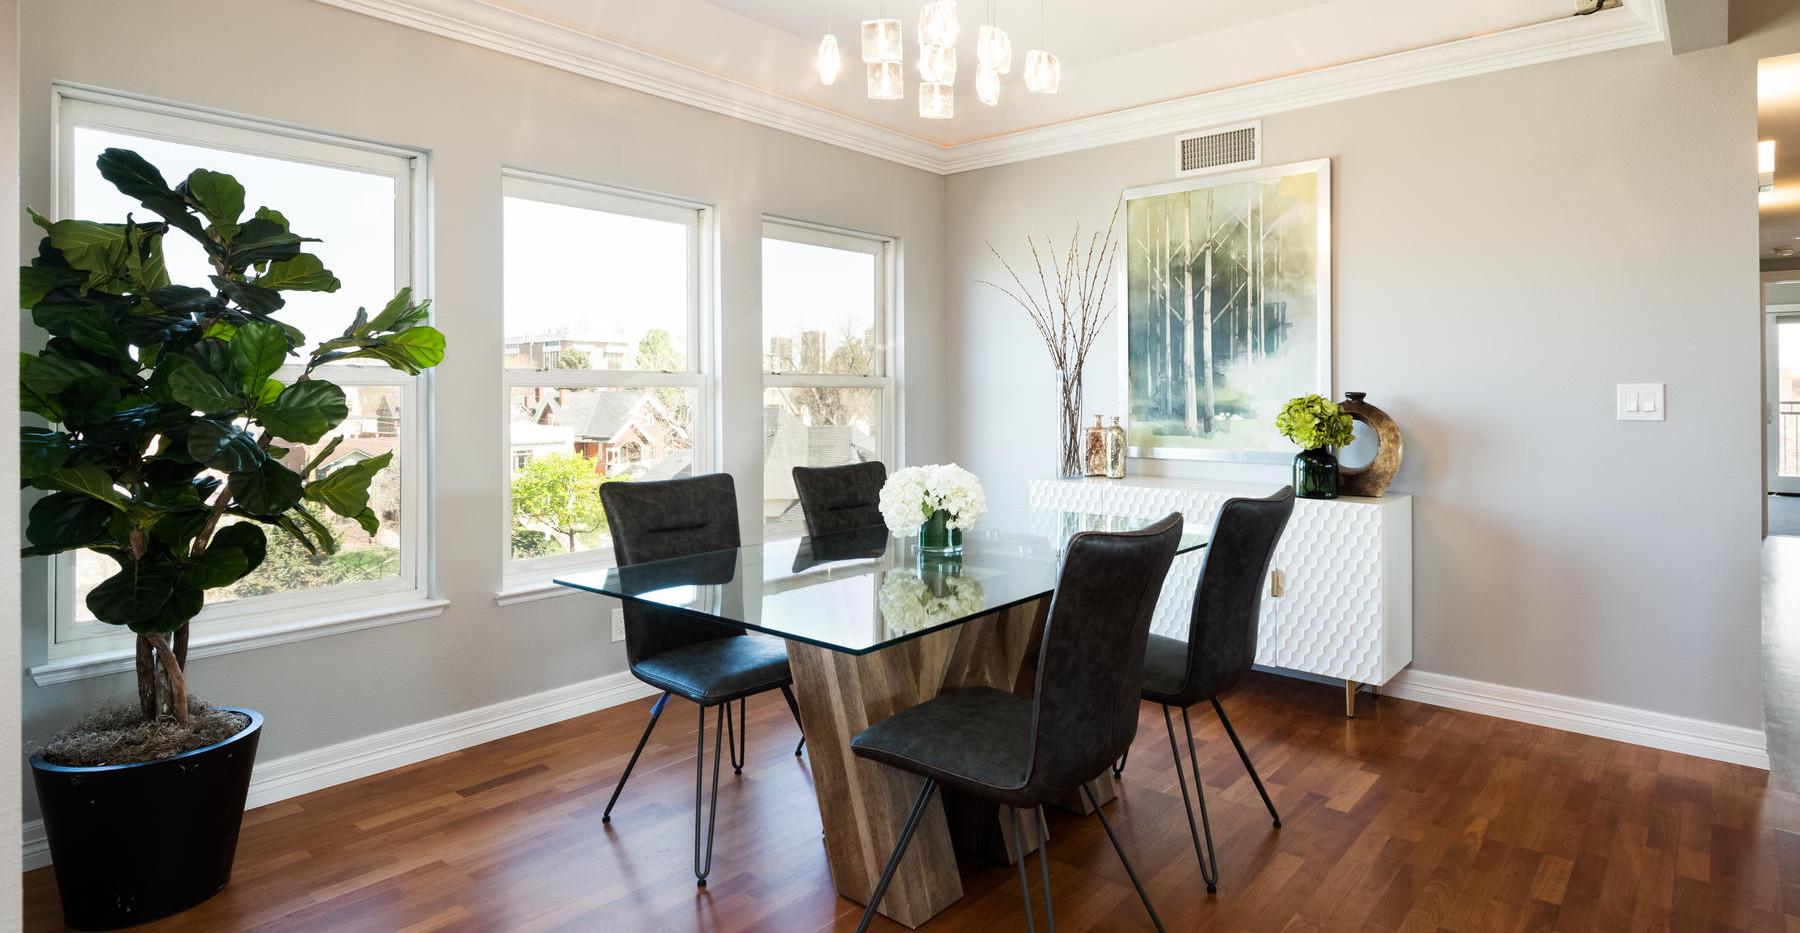 920 E 17th Avenue-020-026-Dining Room-ML